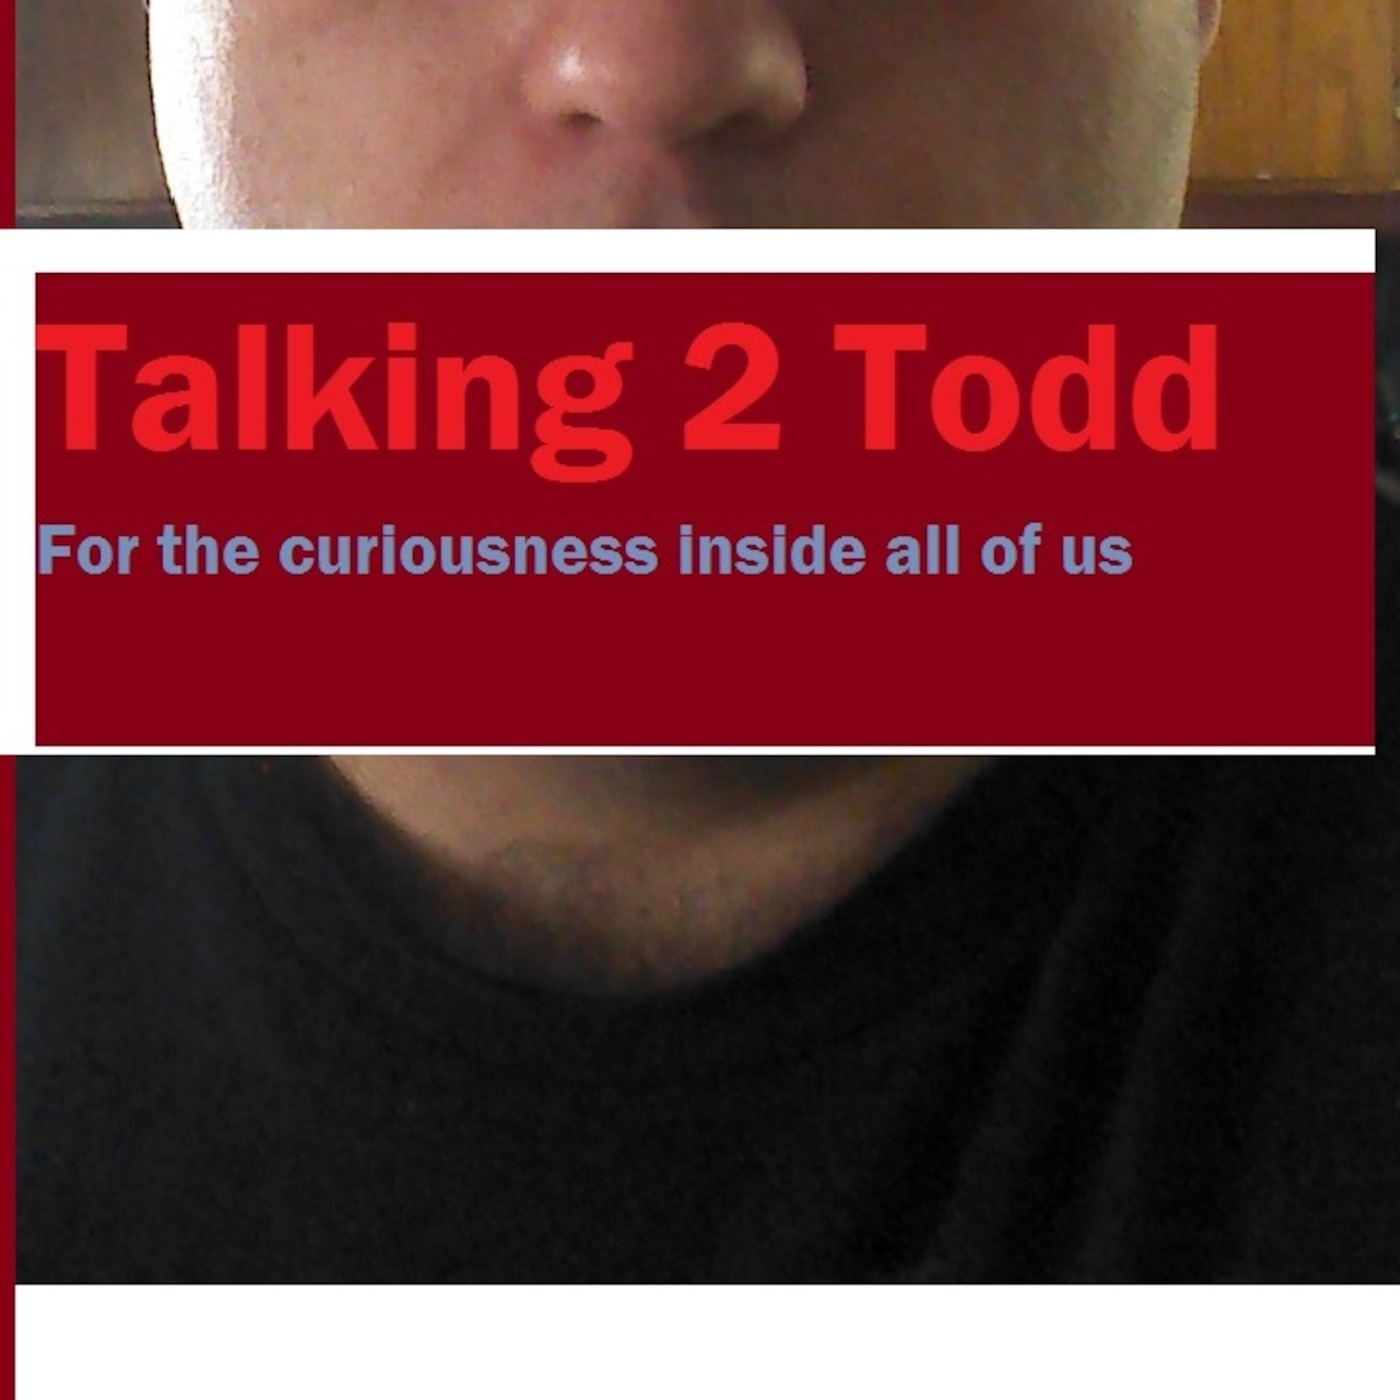 Talking 2 Todd